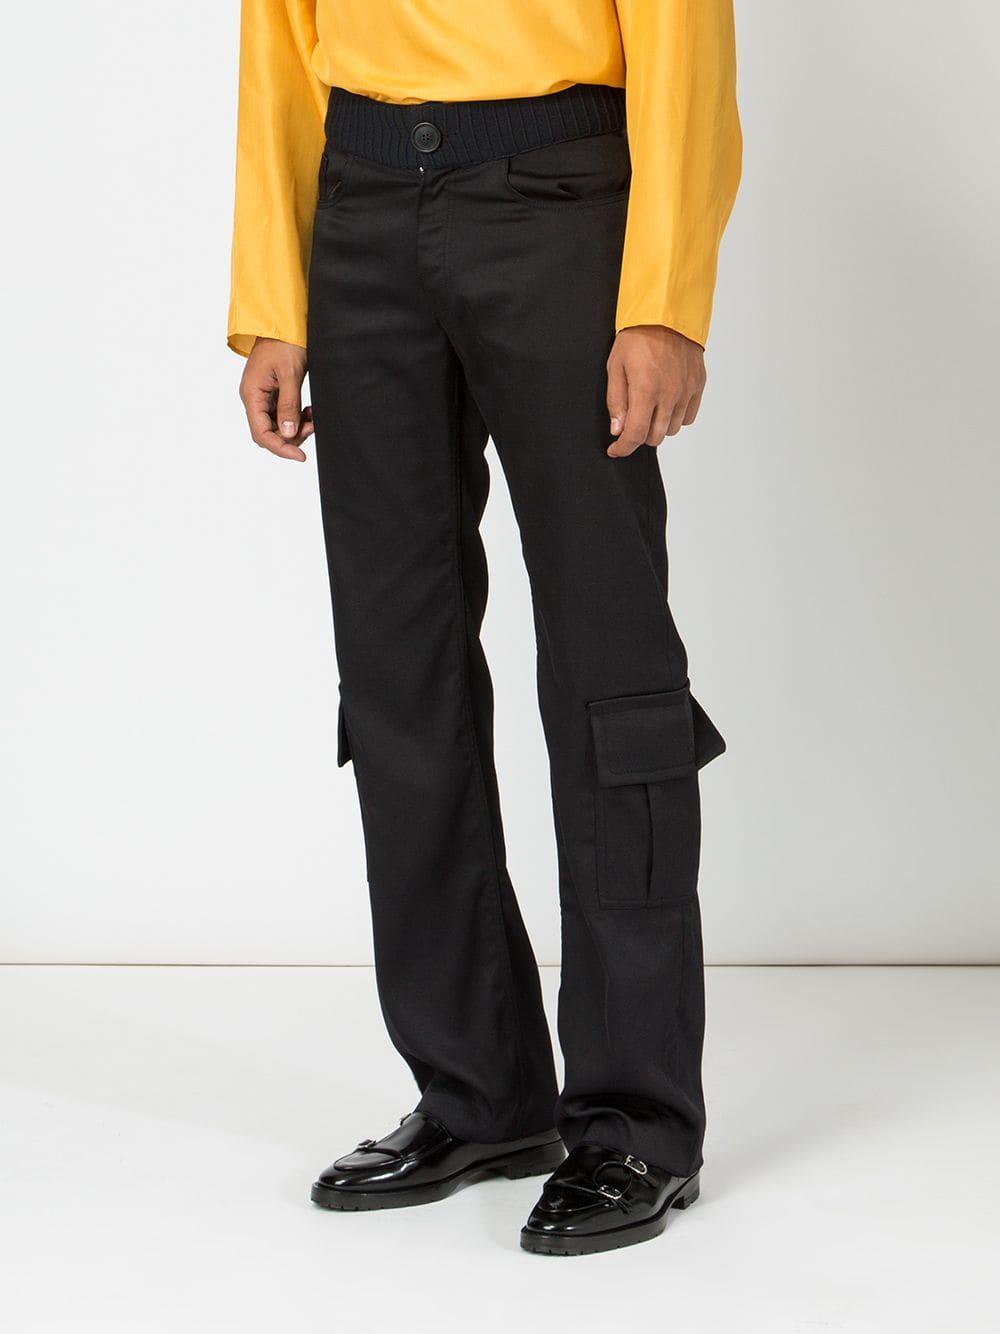 Wales Bonner Cargo Trousers in Black for Men